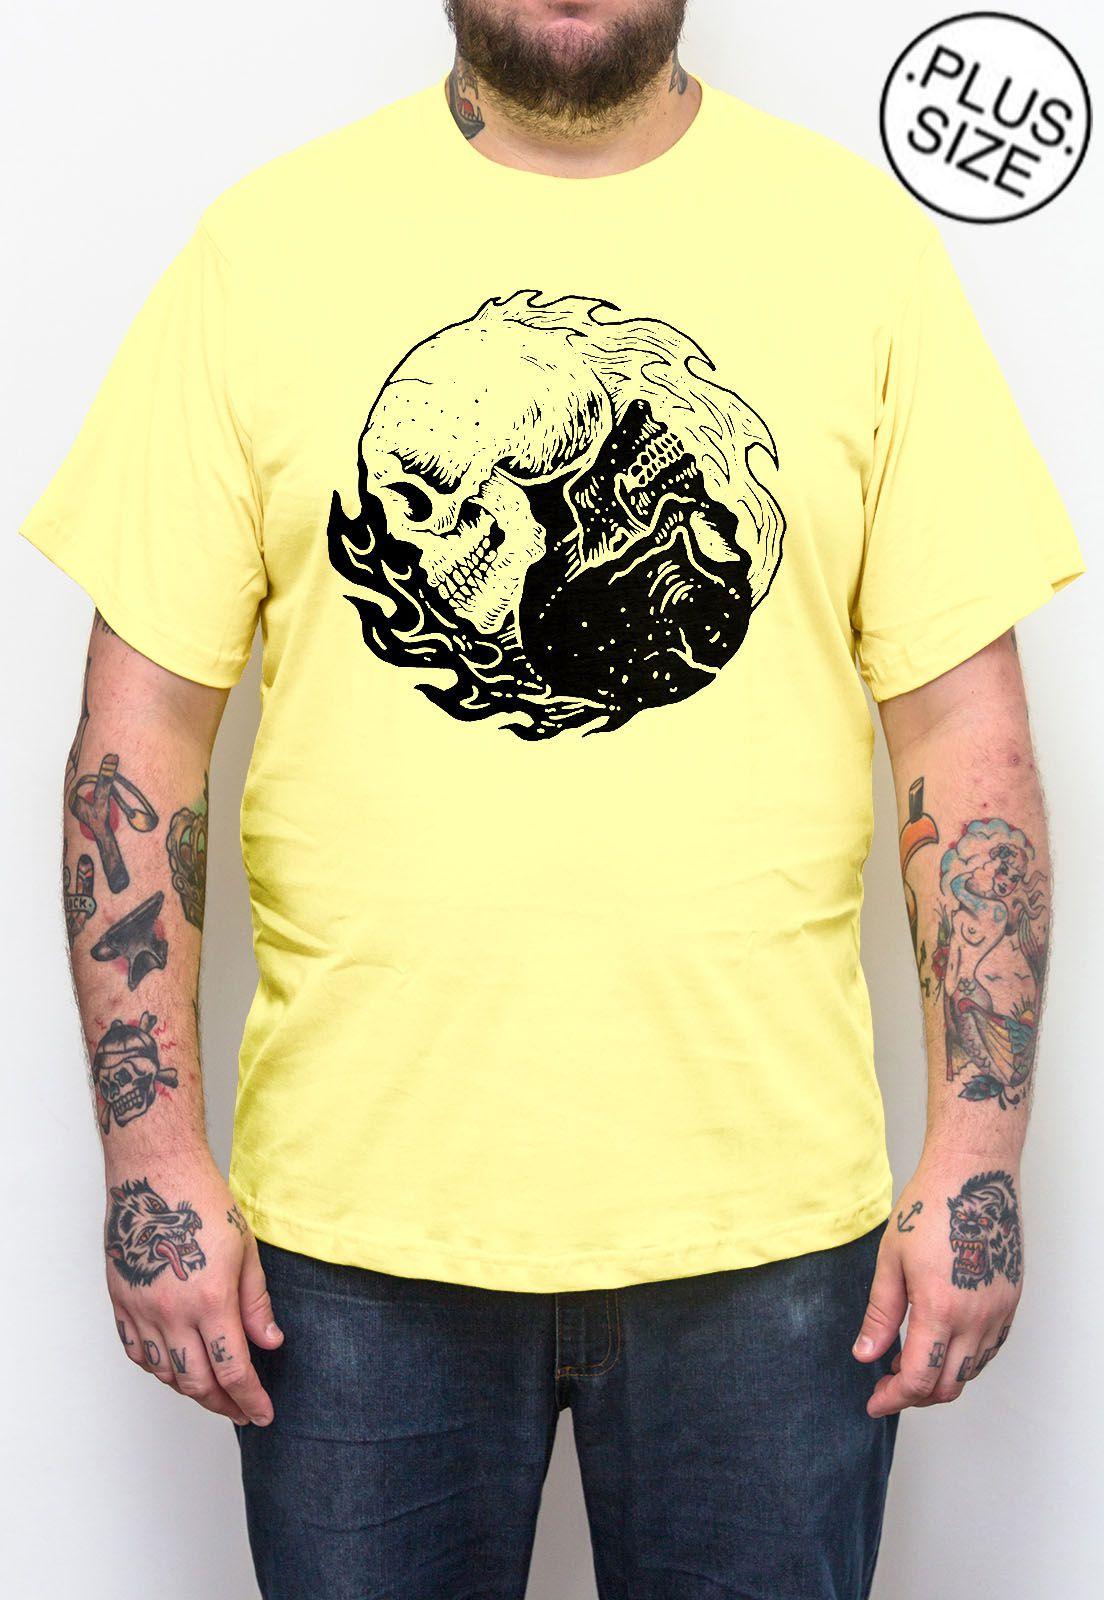 Camiseta Hshop Equilibrium - Amarelo Bebê - Plus Size - Tamanho Grande XG  - HShop